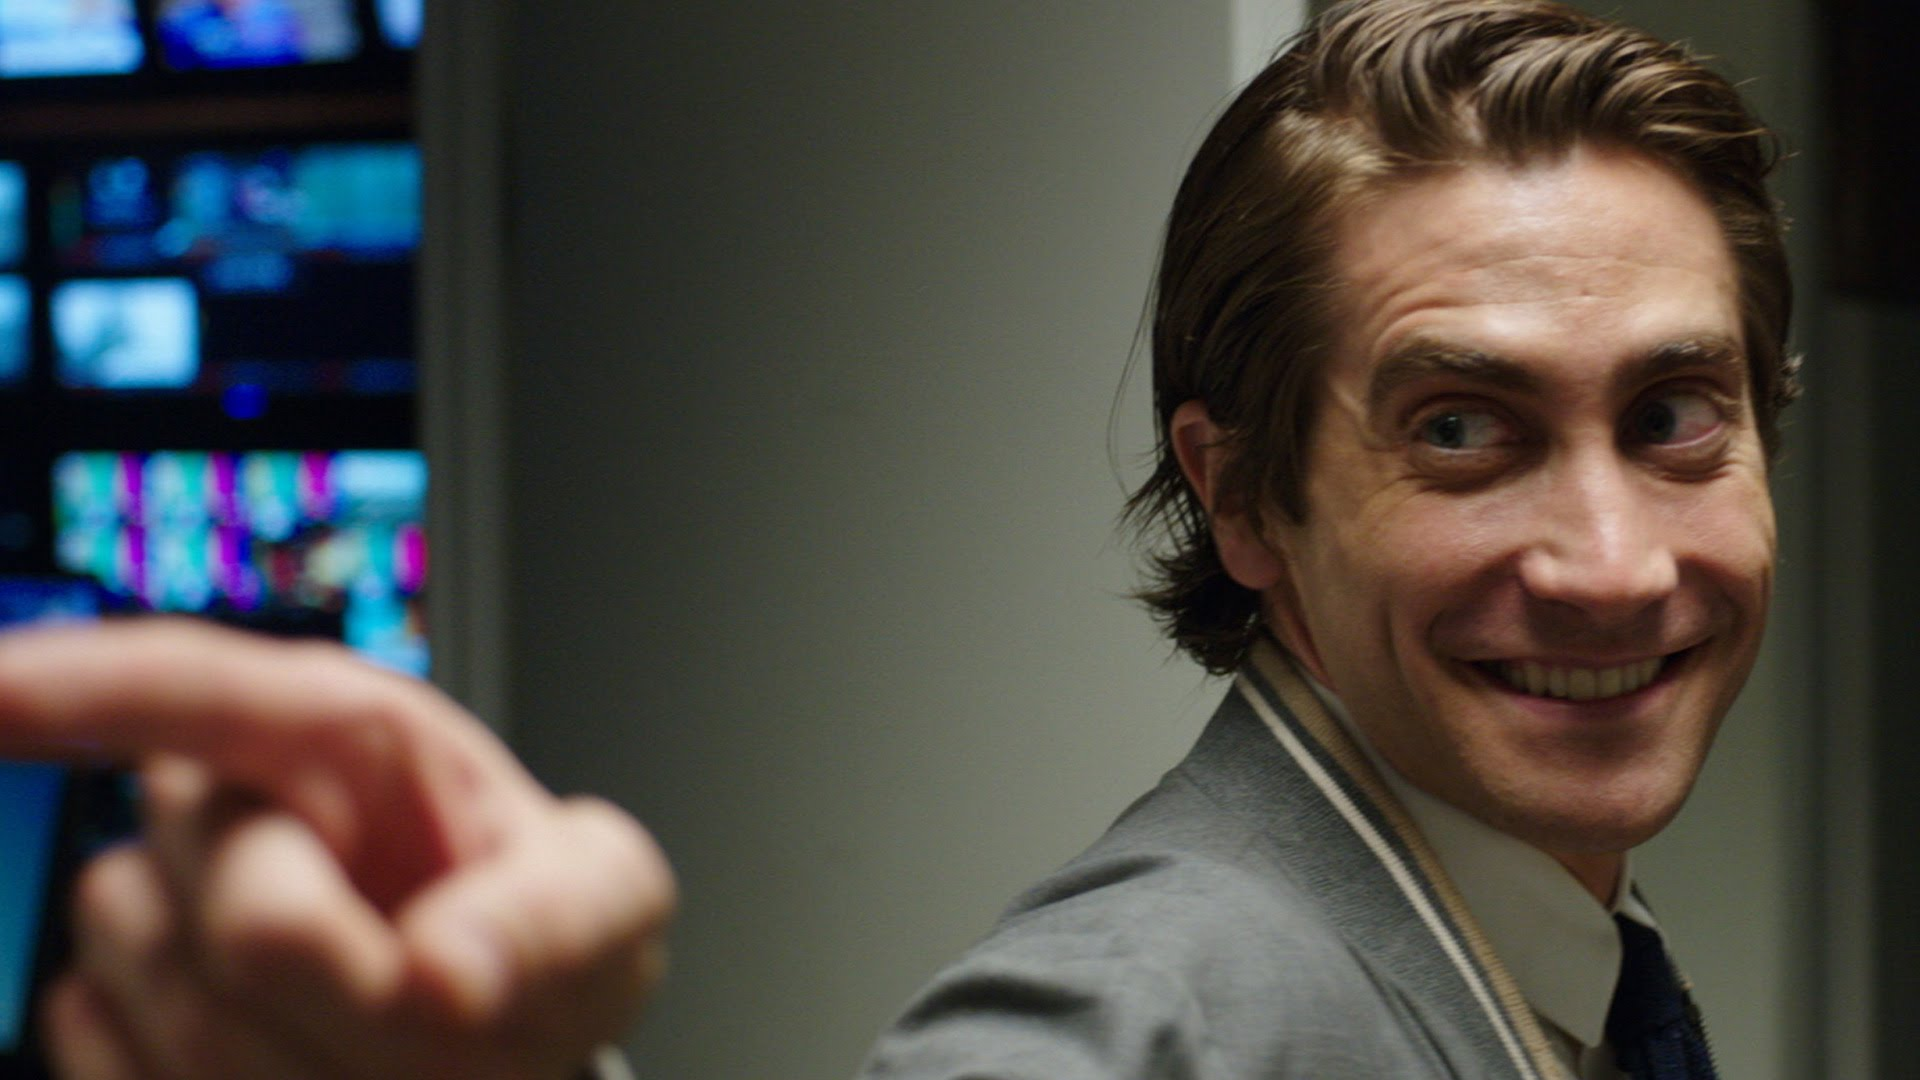 Nightcrawler Movie Review and Plot - Jake Gyllenhaal, Dan Gilroy